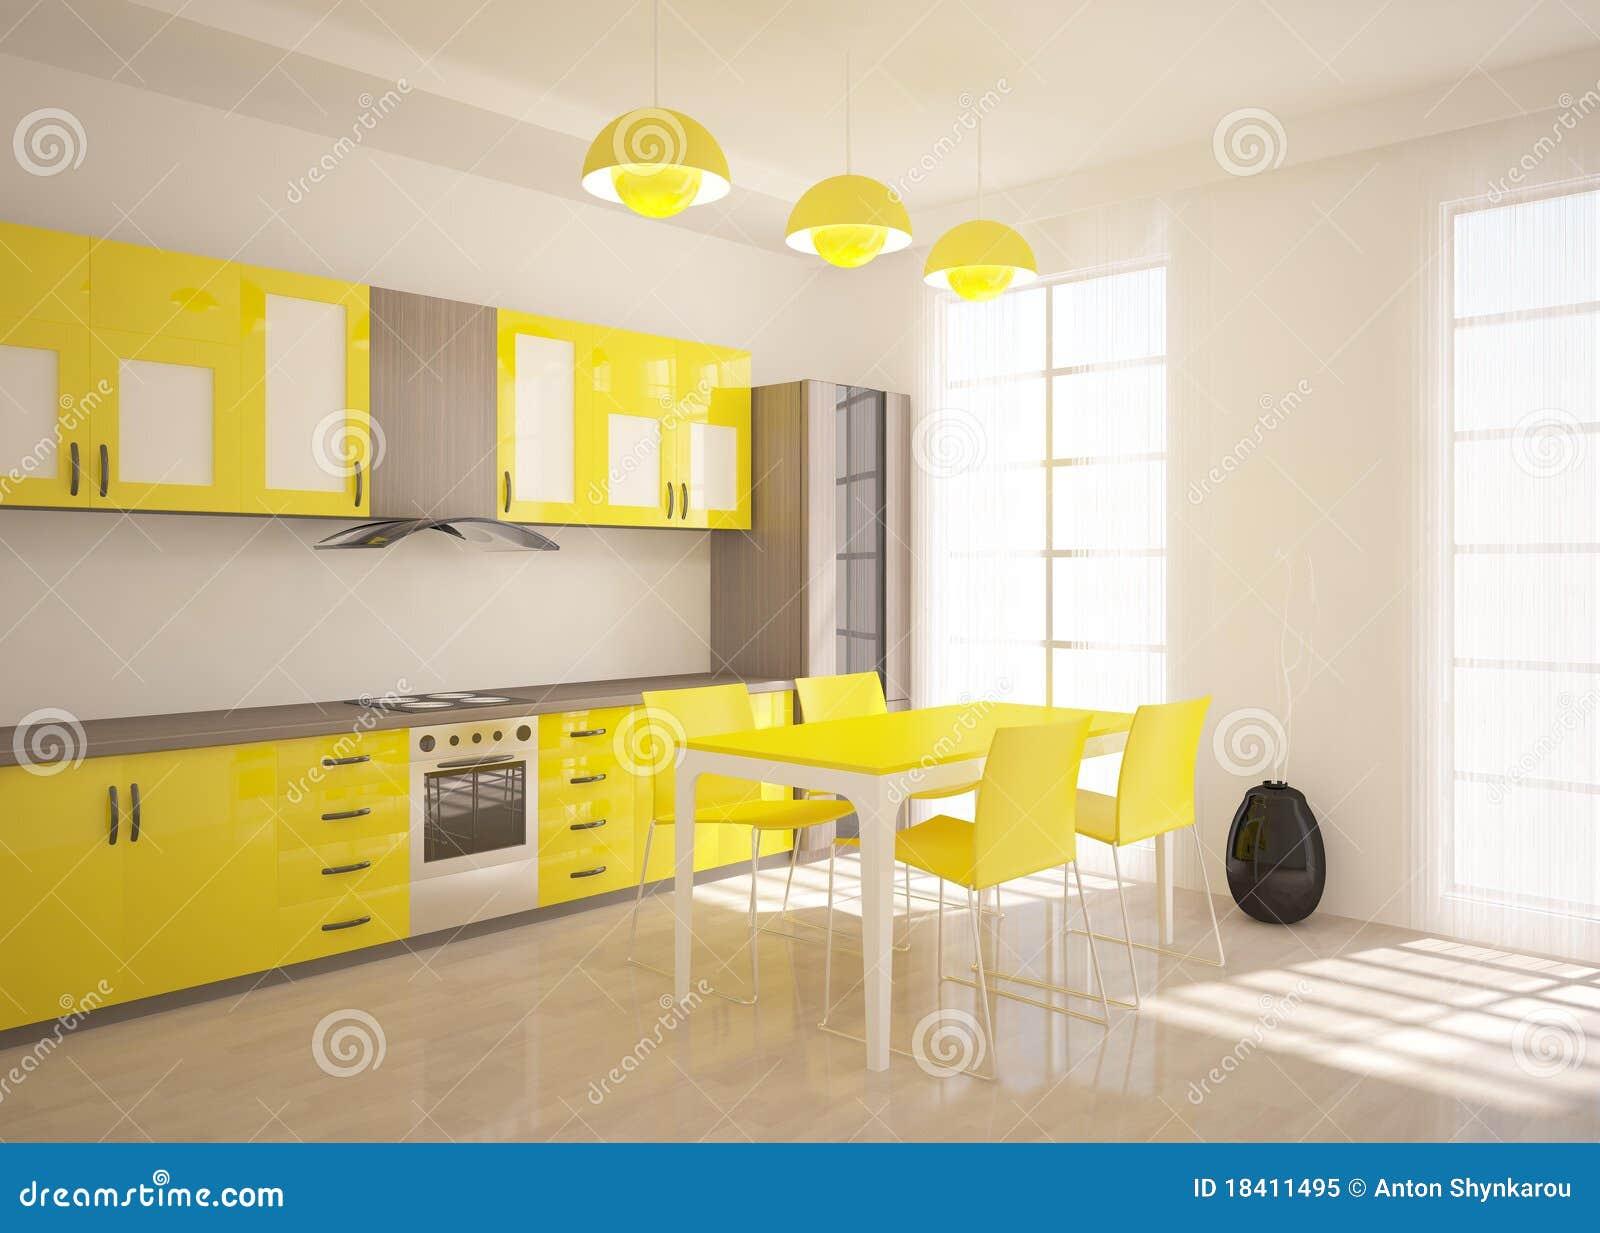 gelbe k che lizenzfreies stockfoto bild 18411495. Black Bedroom Furniture Sets. Home Design Ideas